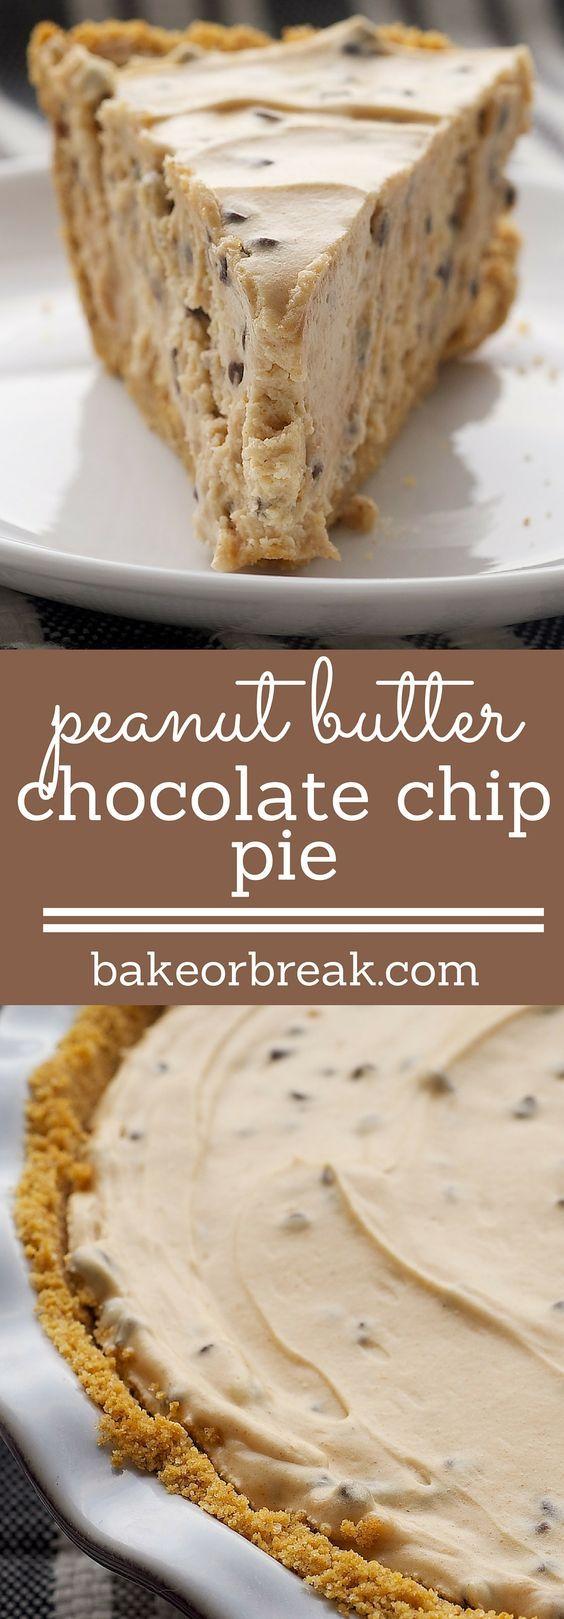 Peanut Butter-Chocolate Chip Pie is a cool, creamy dessert featuring everyone's favorite flavor combination. - Bake or Break ~ http://www.bakeorbreak.com